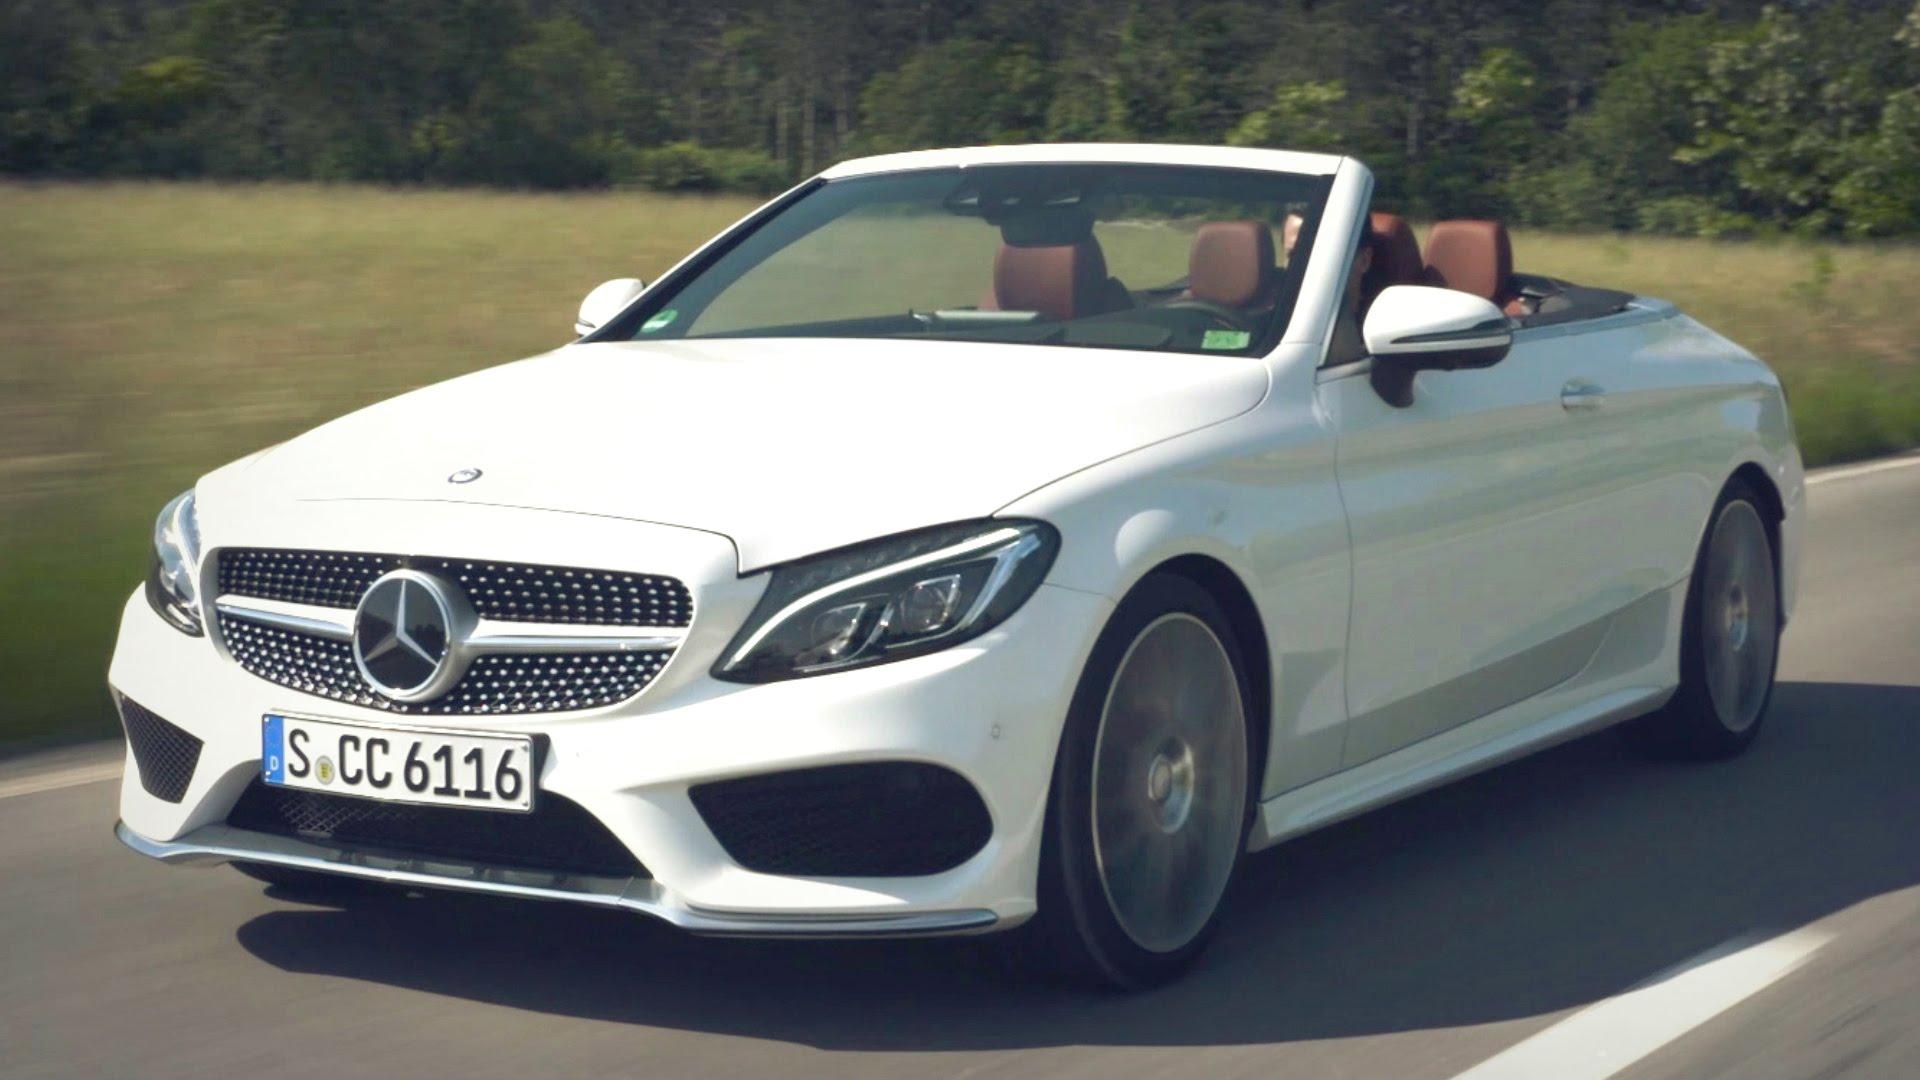 2017 Mercedes C 300 Cabriolet Diamond White Bright - YouTube